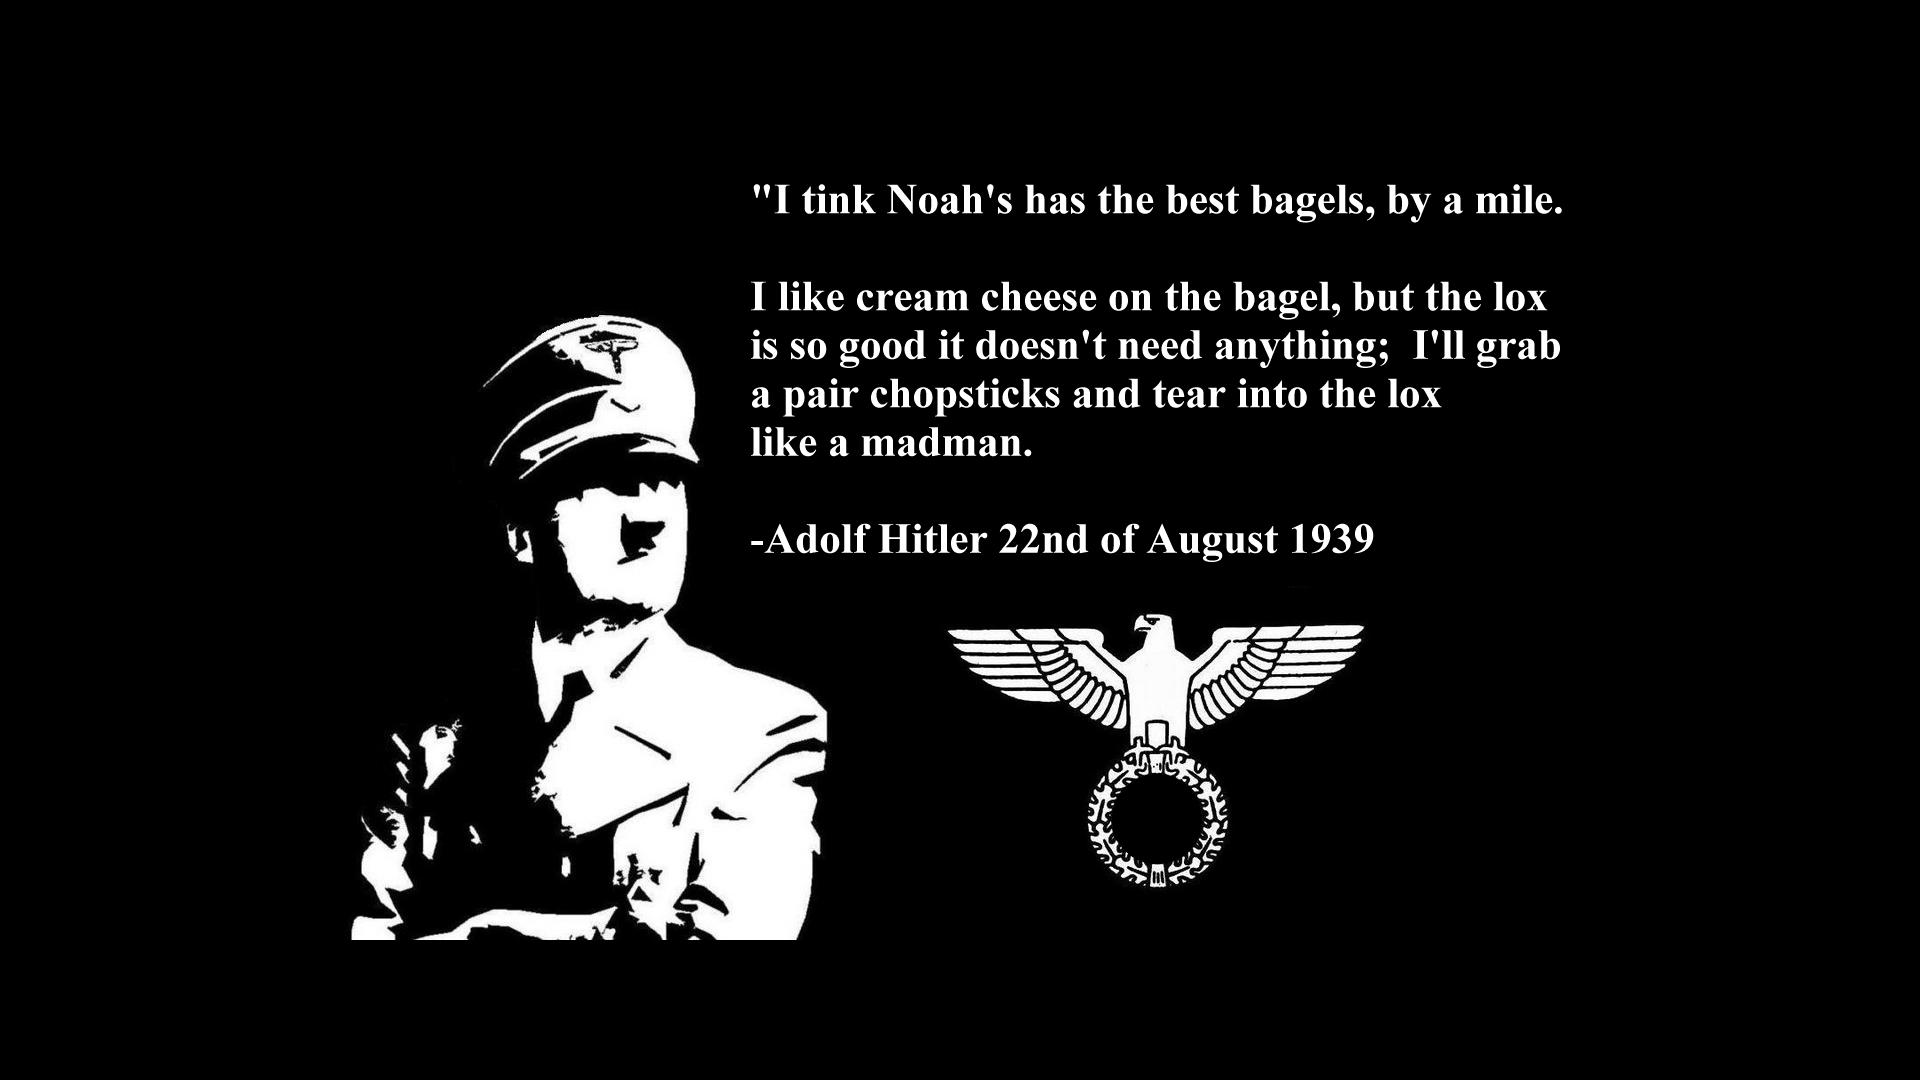 Adolf Hitler Wallpaper: Adolf Hitler Live Wallpaper Download Adolf Hitler Live